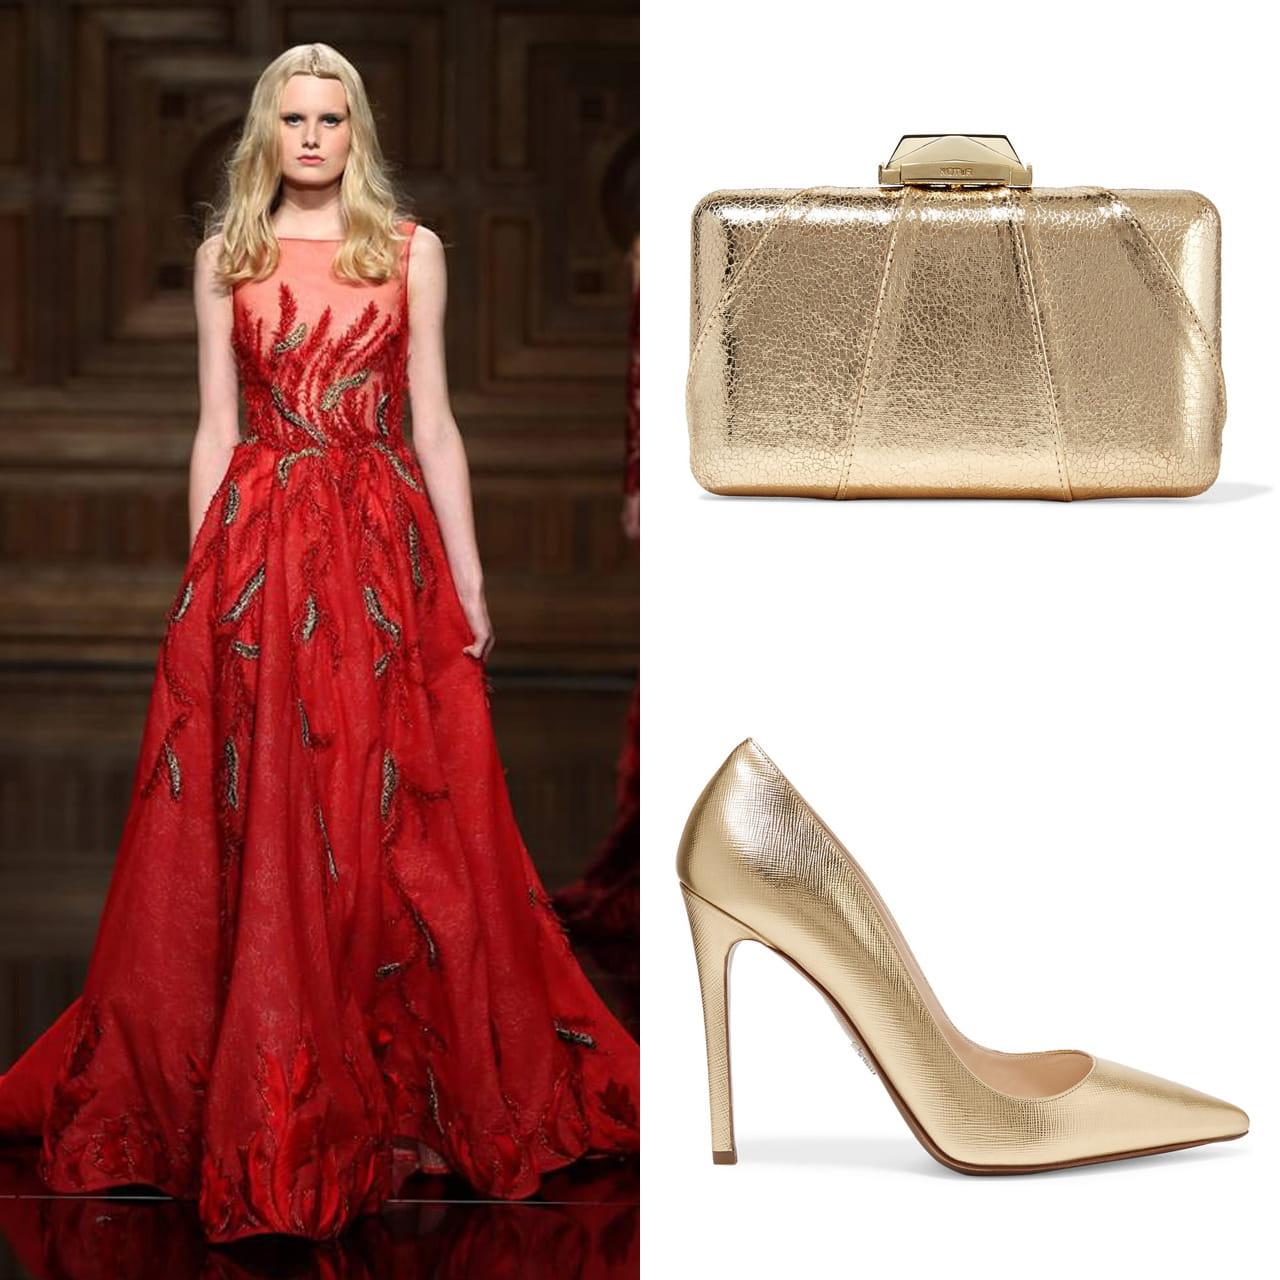 2a3412b7a39c1 5 نصائح لإختيار الاكسسوار المناسب لتزيين الفستان الأحمر